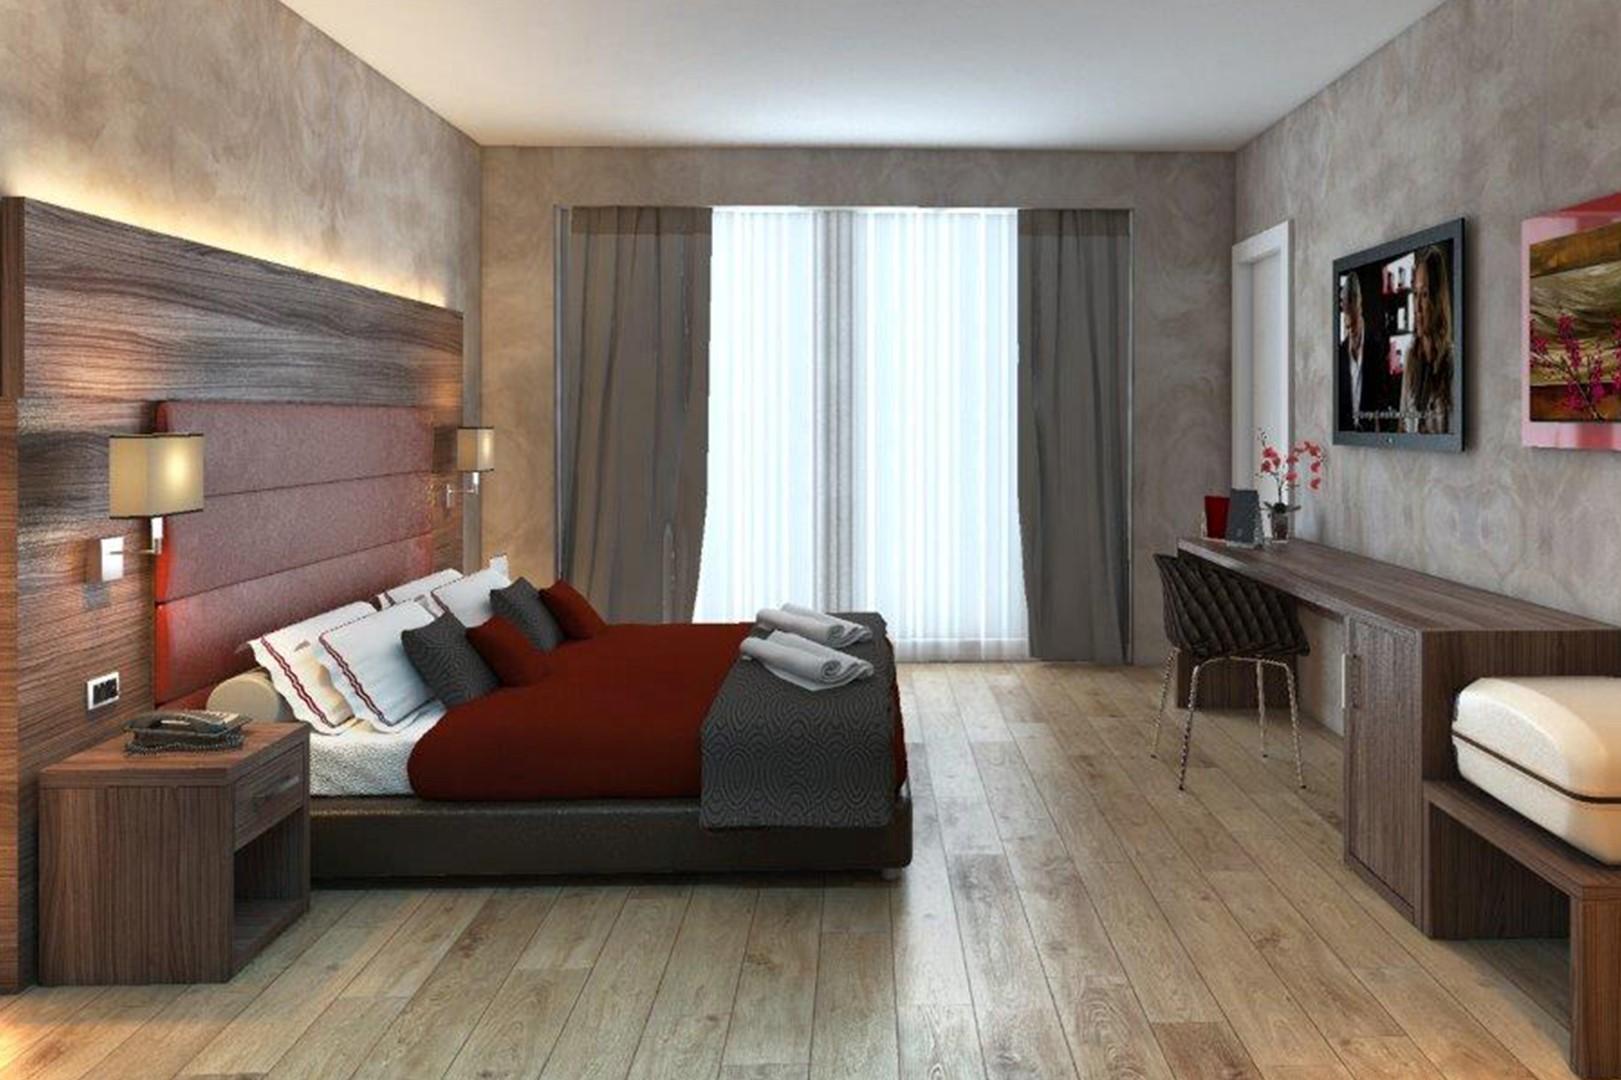 furniture_0010_2.double room_hotel furniture (18)